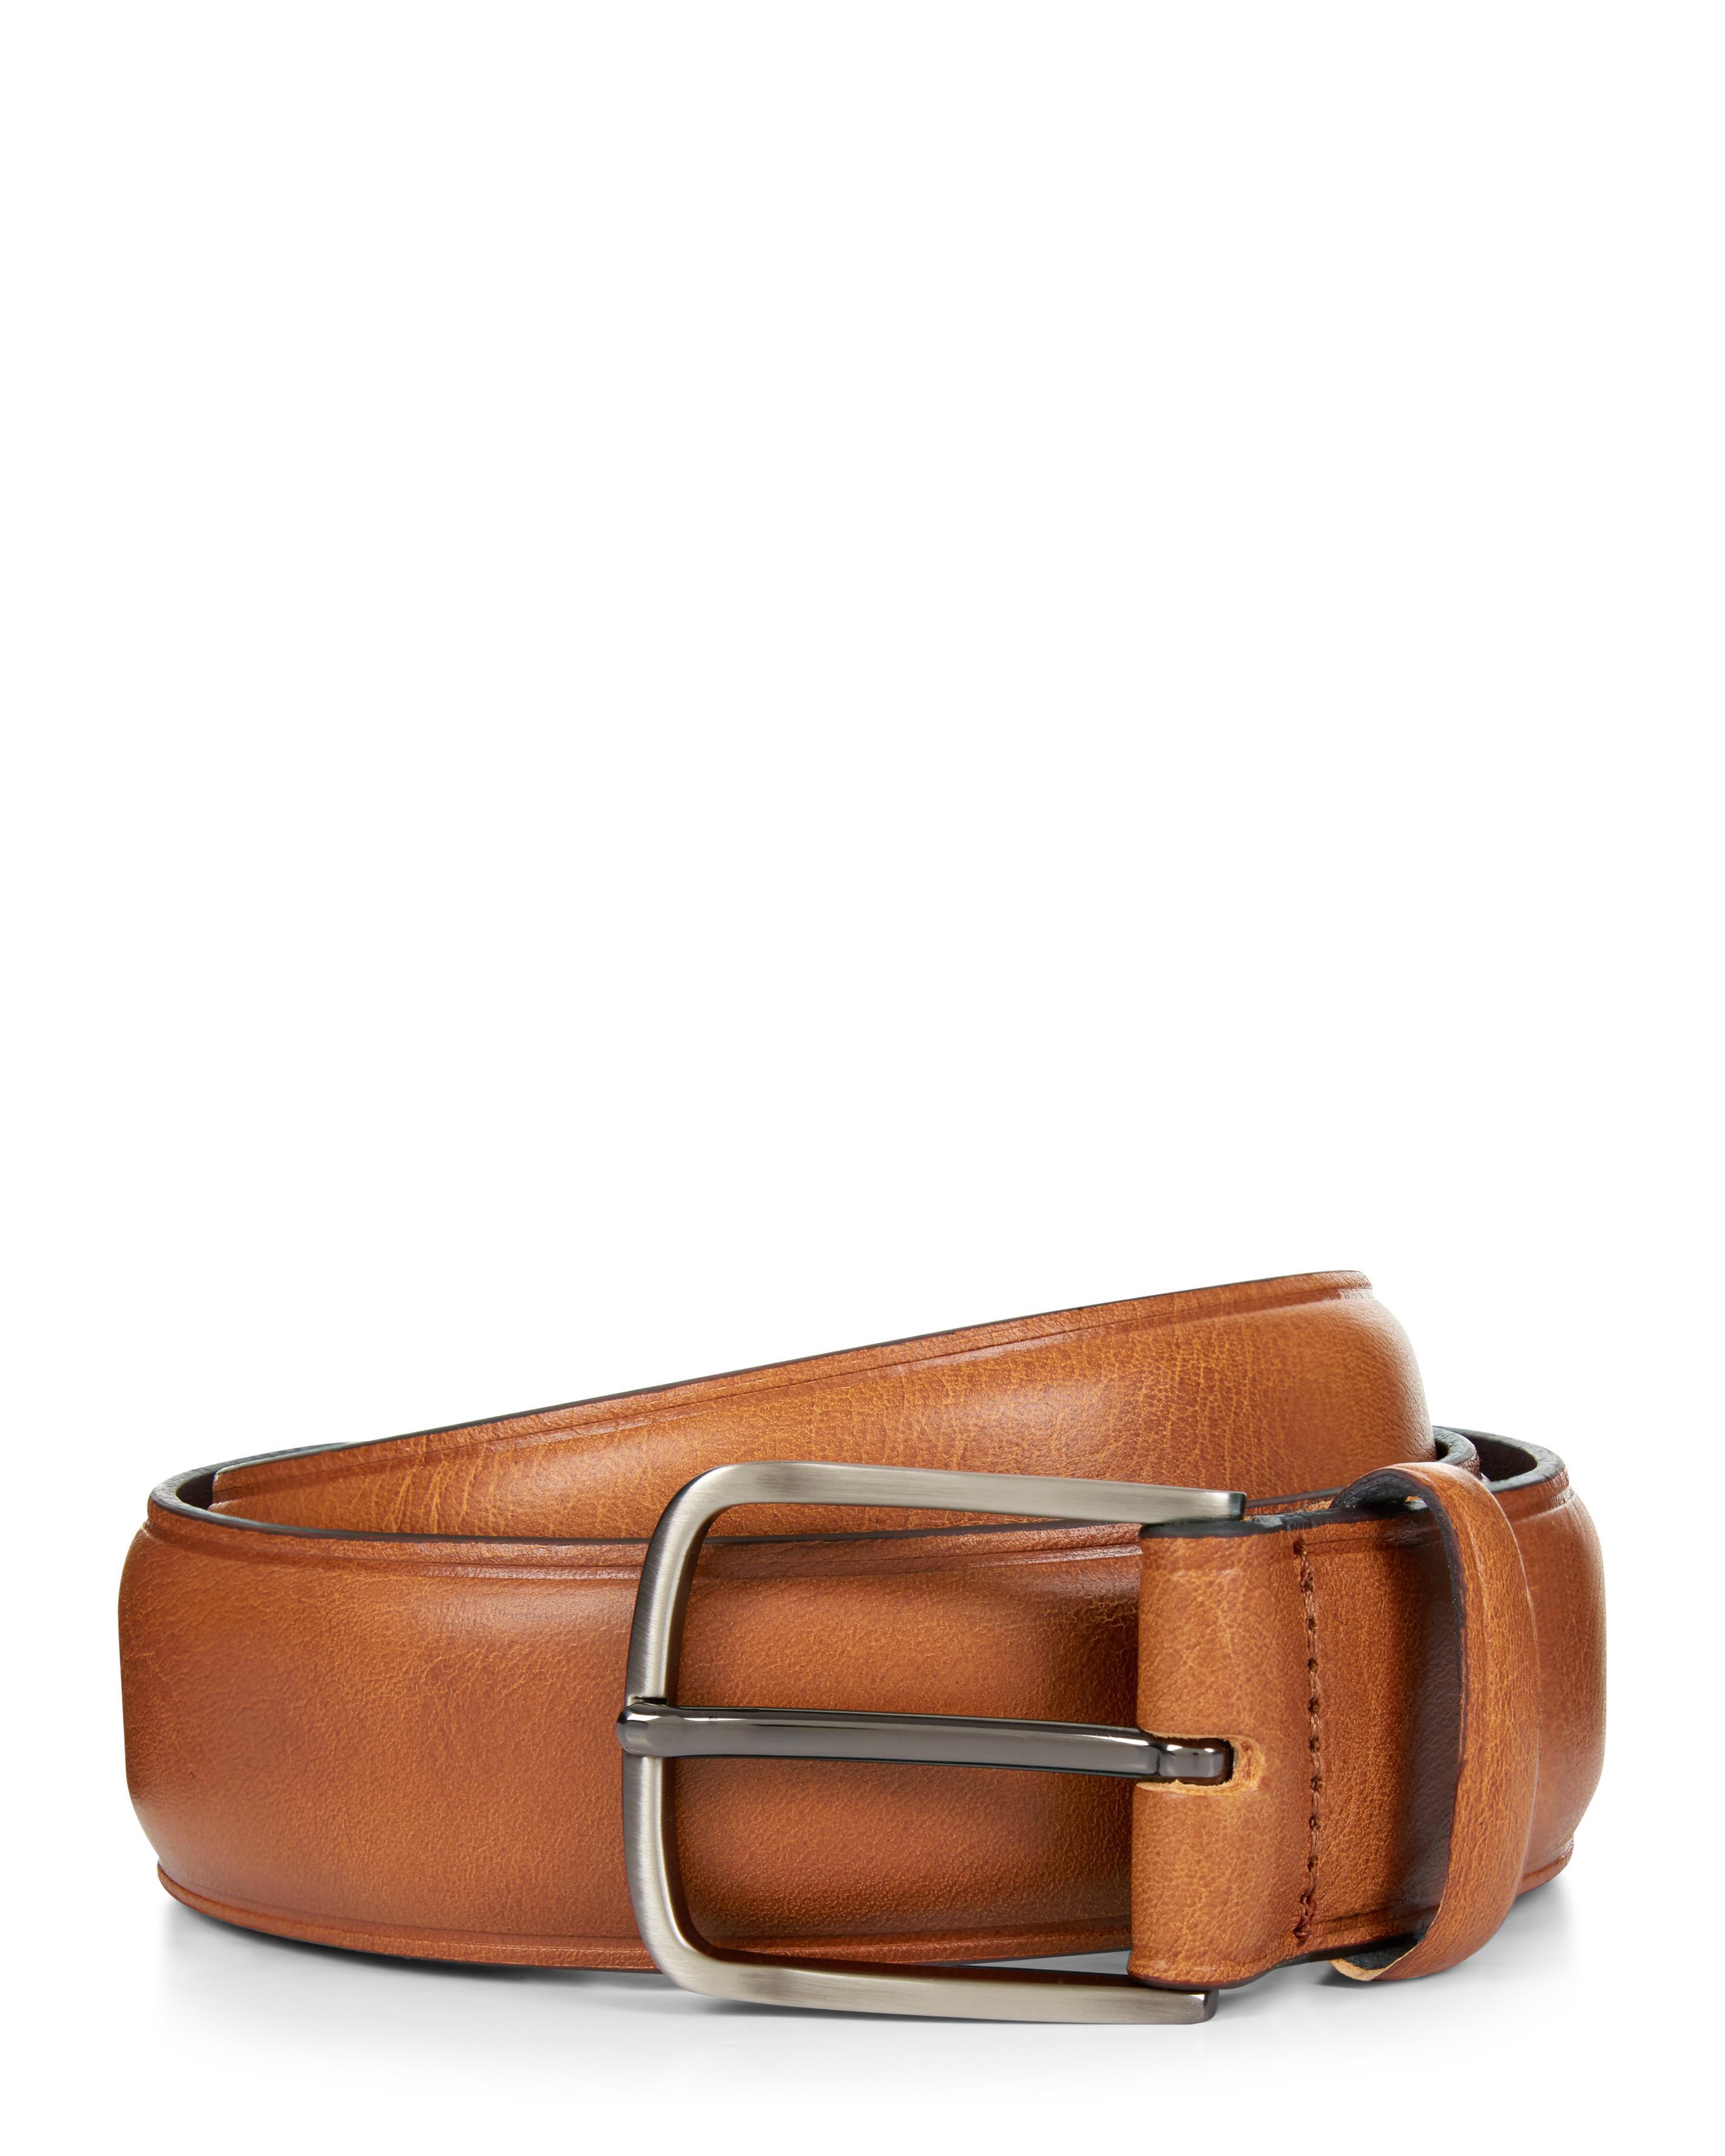 6b57f5d1e07 Jaeger - Brown Casual Tan Pebble Dash Leather Belt for Men - Lyst. View  fullscreen